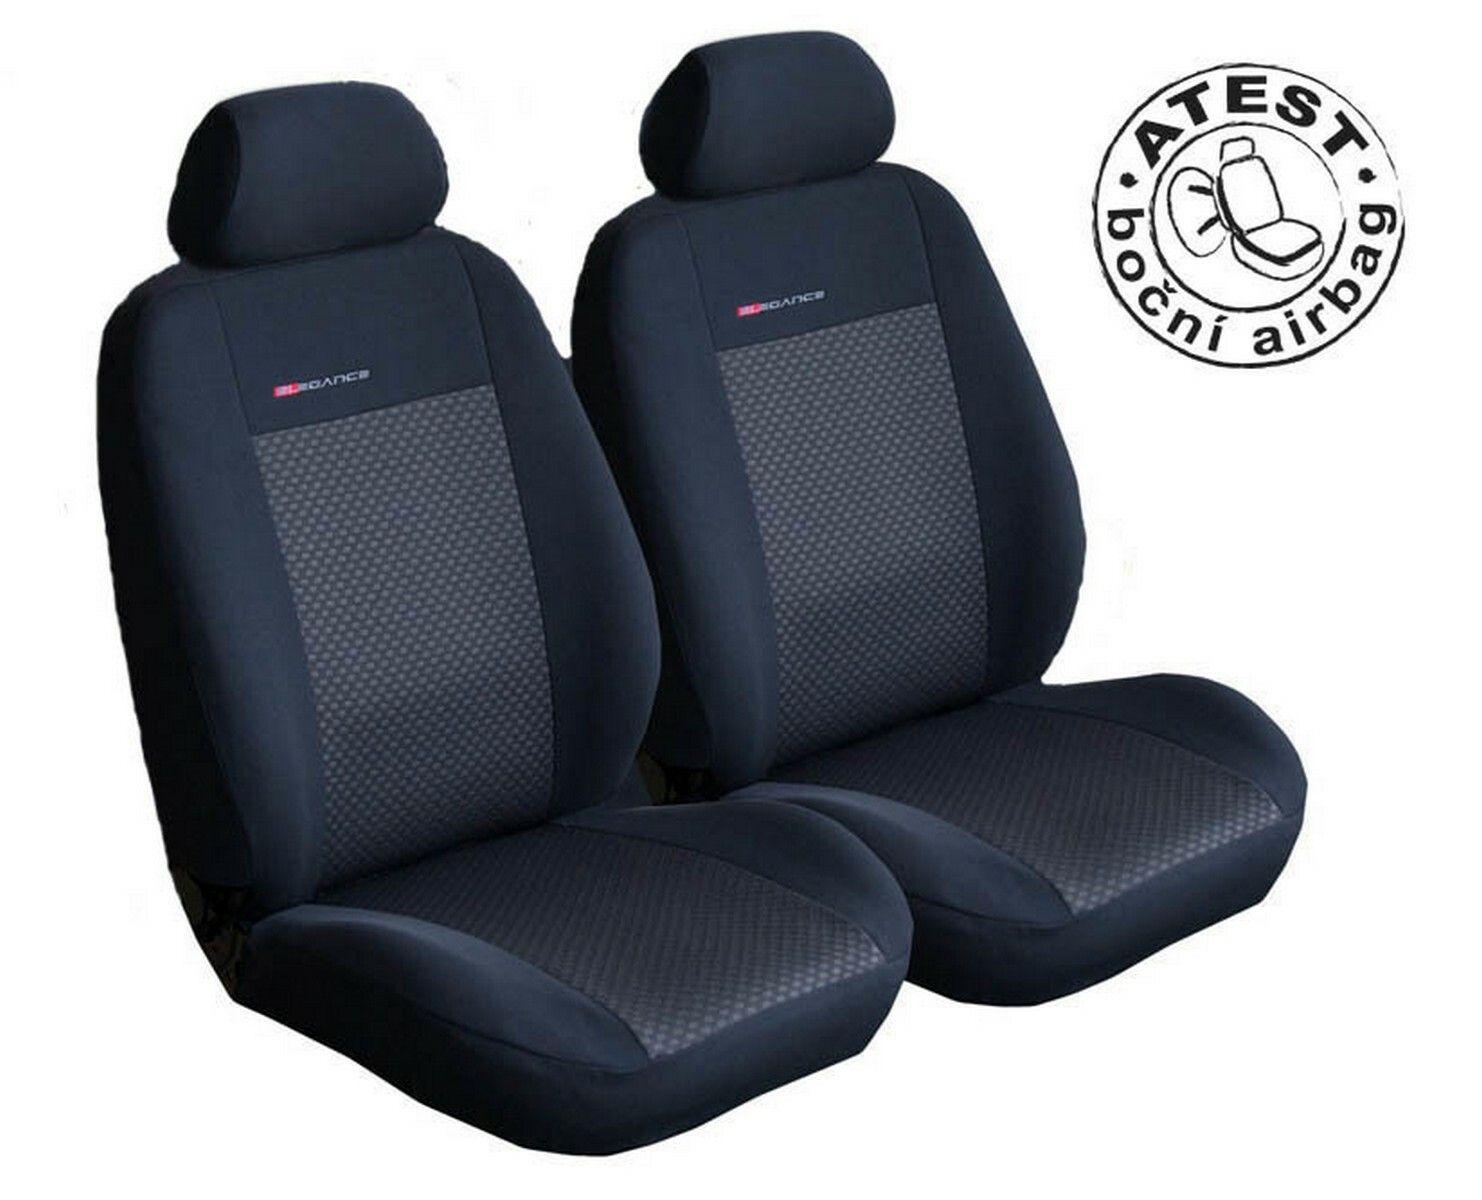 Autopotahy Seat Mii, dělené, od r. 2011, černé SIXTOL